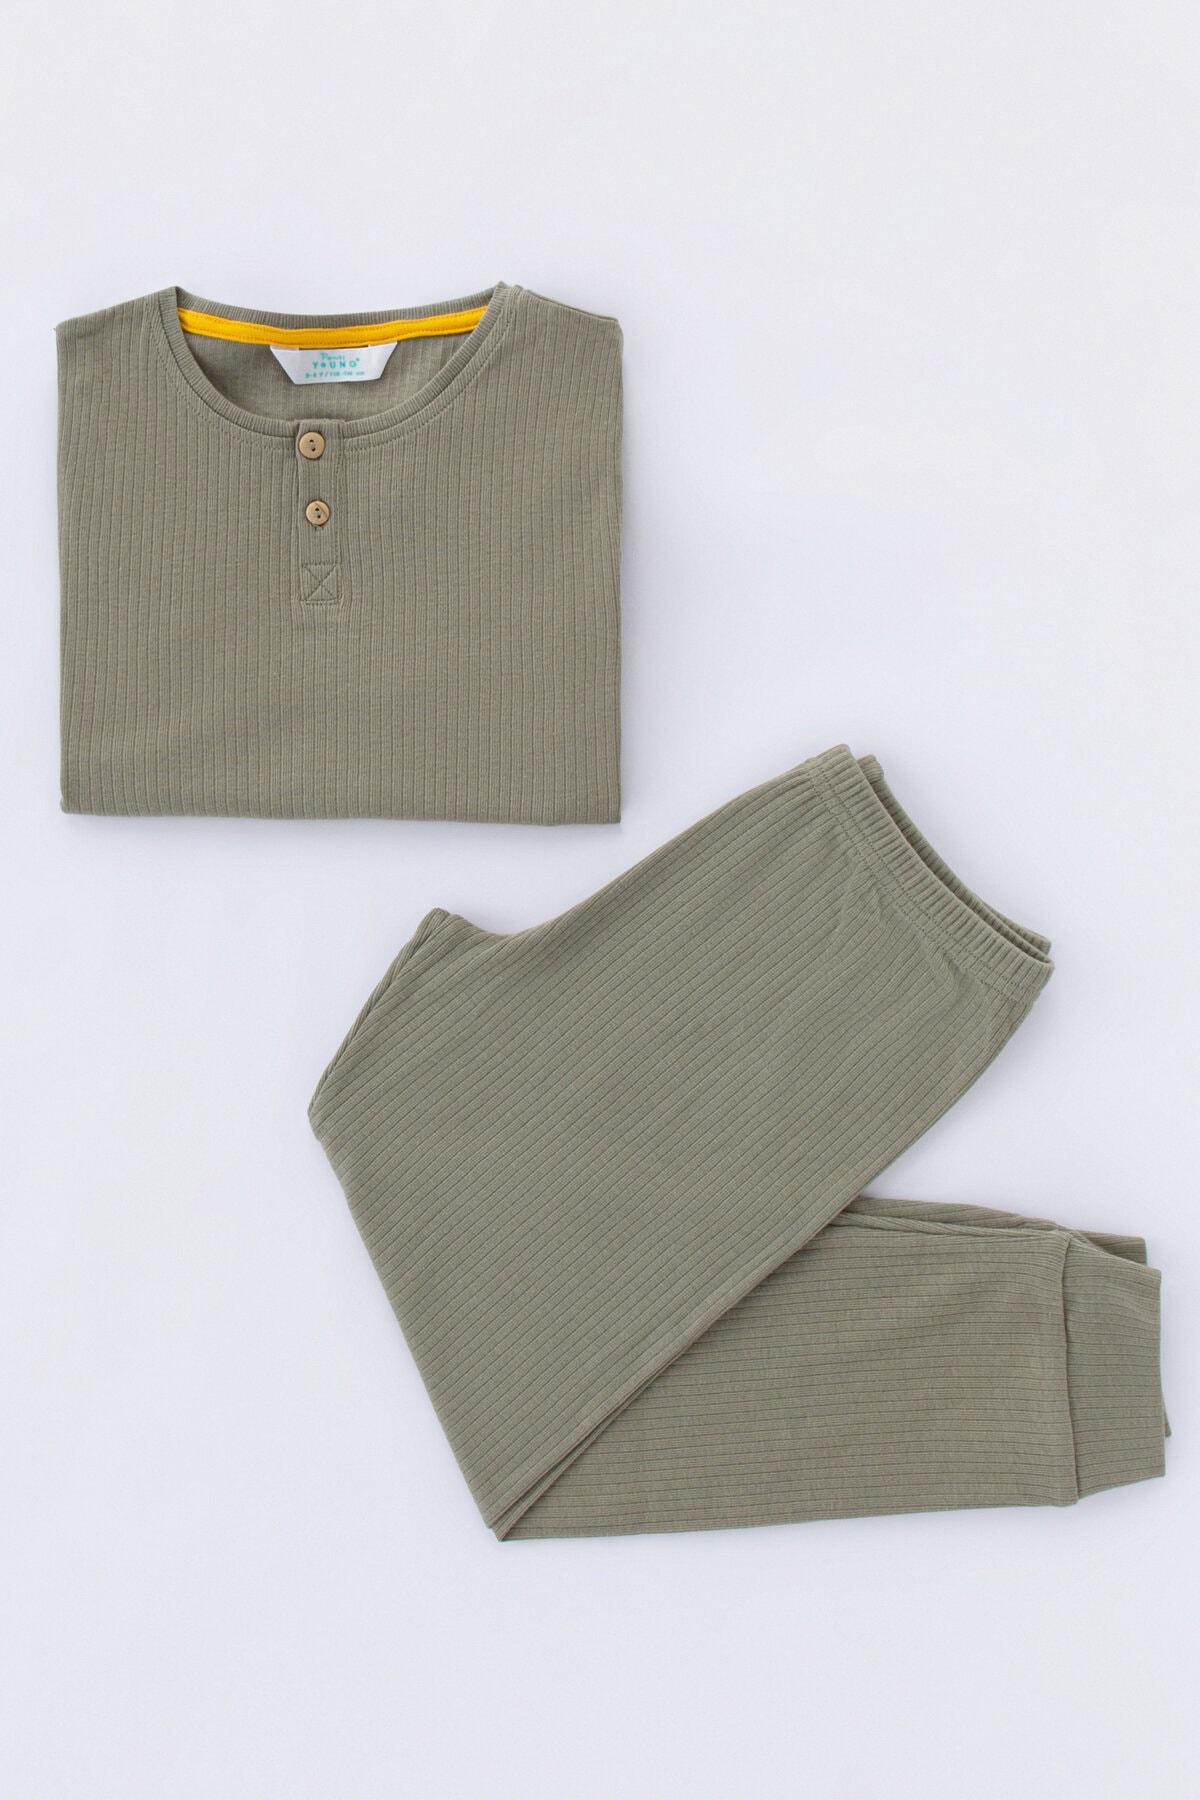 Penti Erkek Çocuk Rıb 2Li Pijama Takımı 1